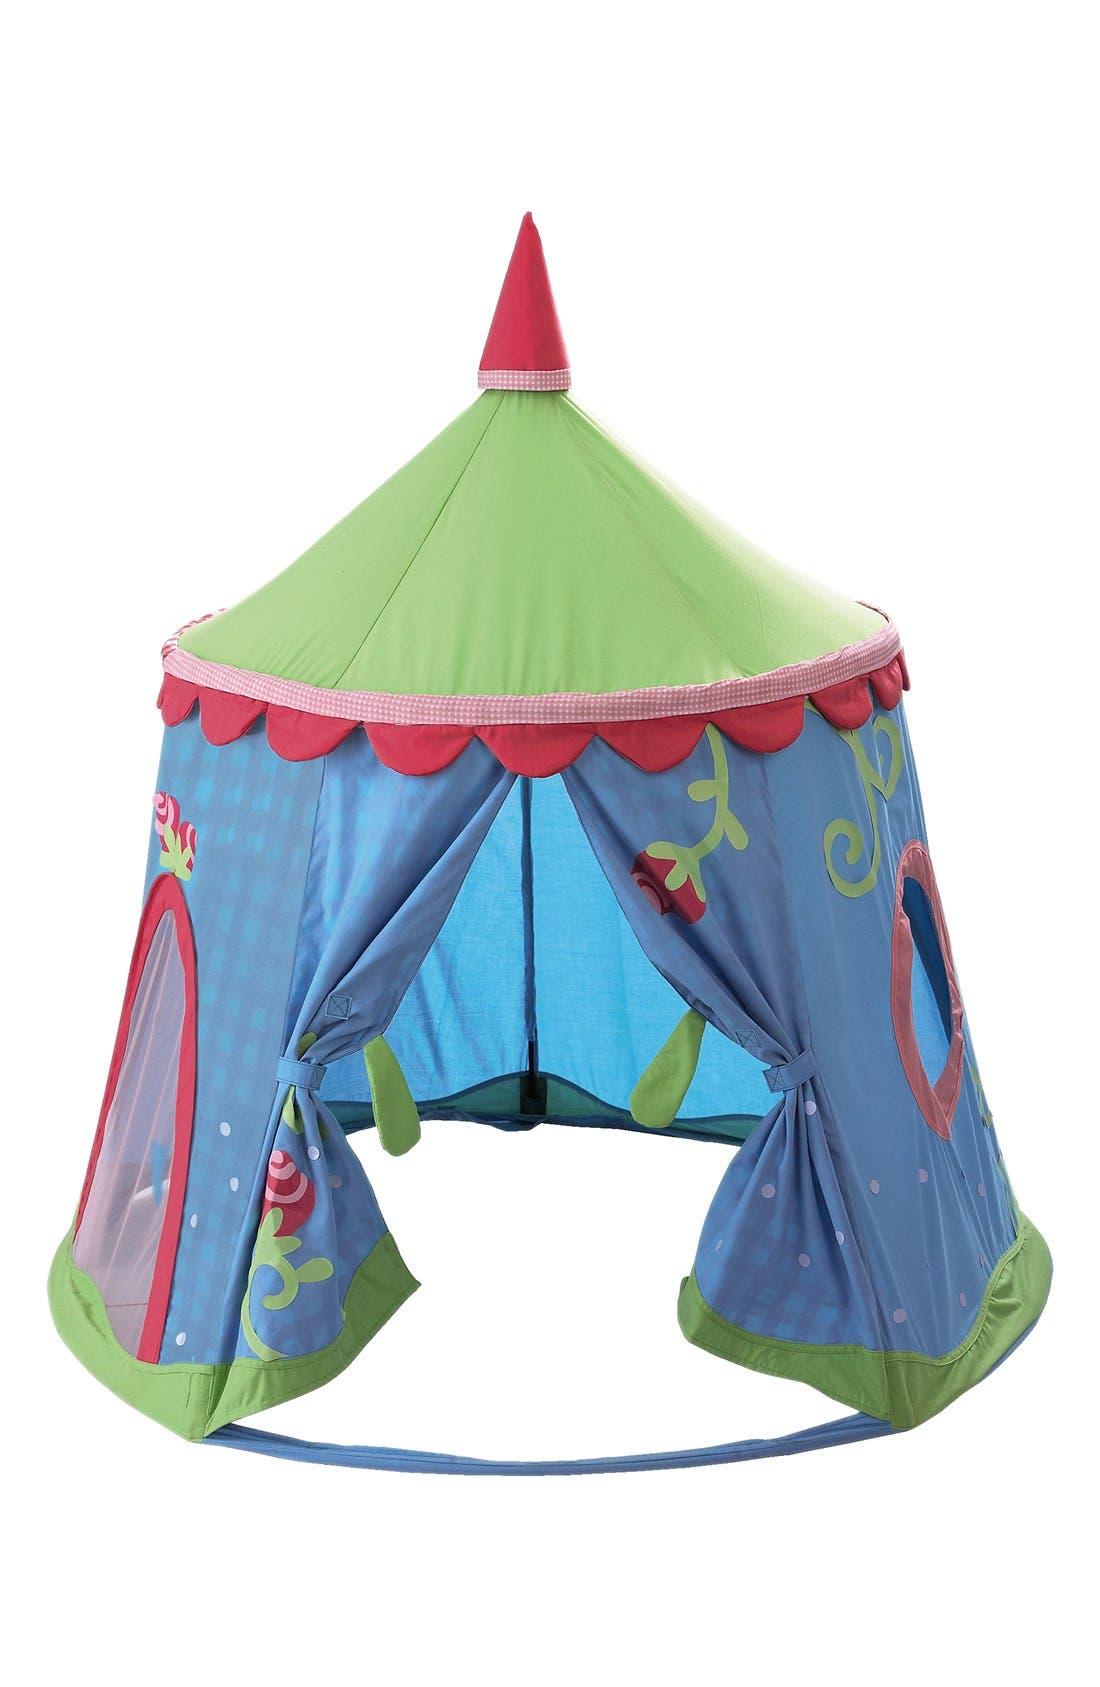 HABA 'Caro-Lini' Play Tent